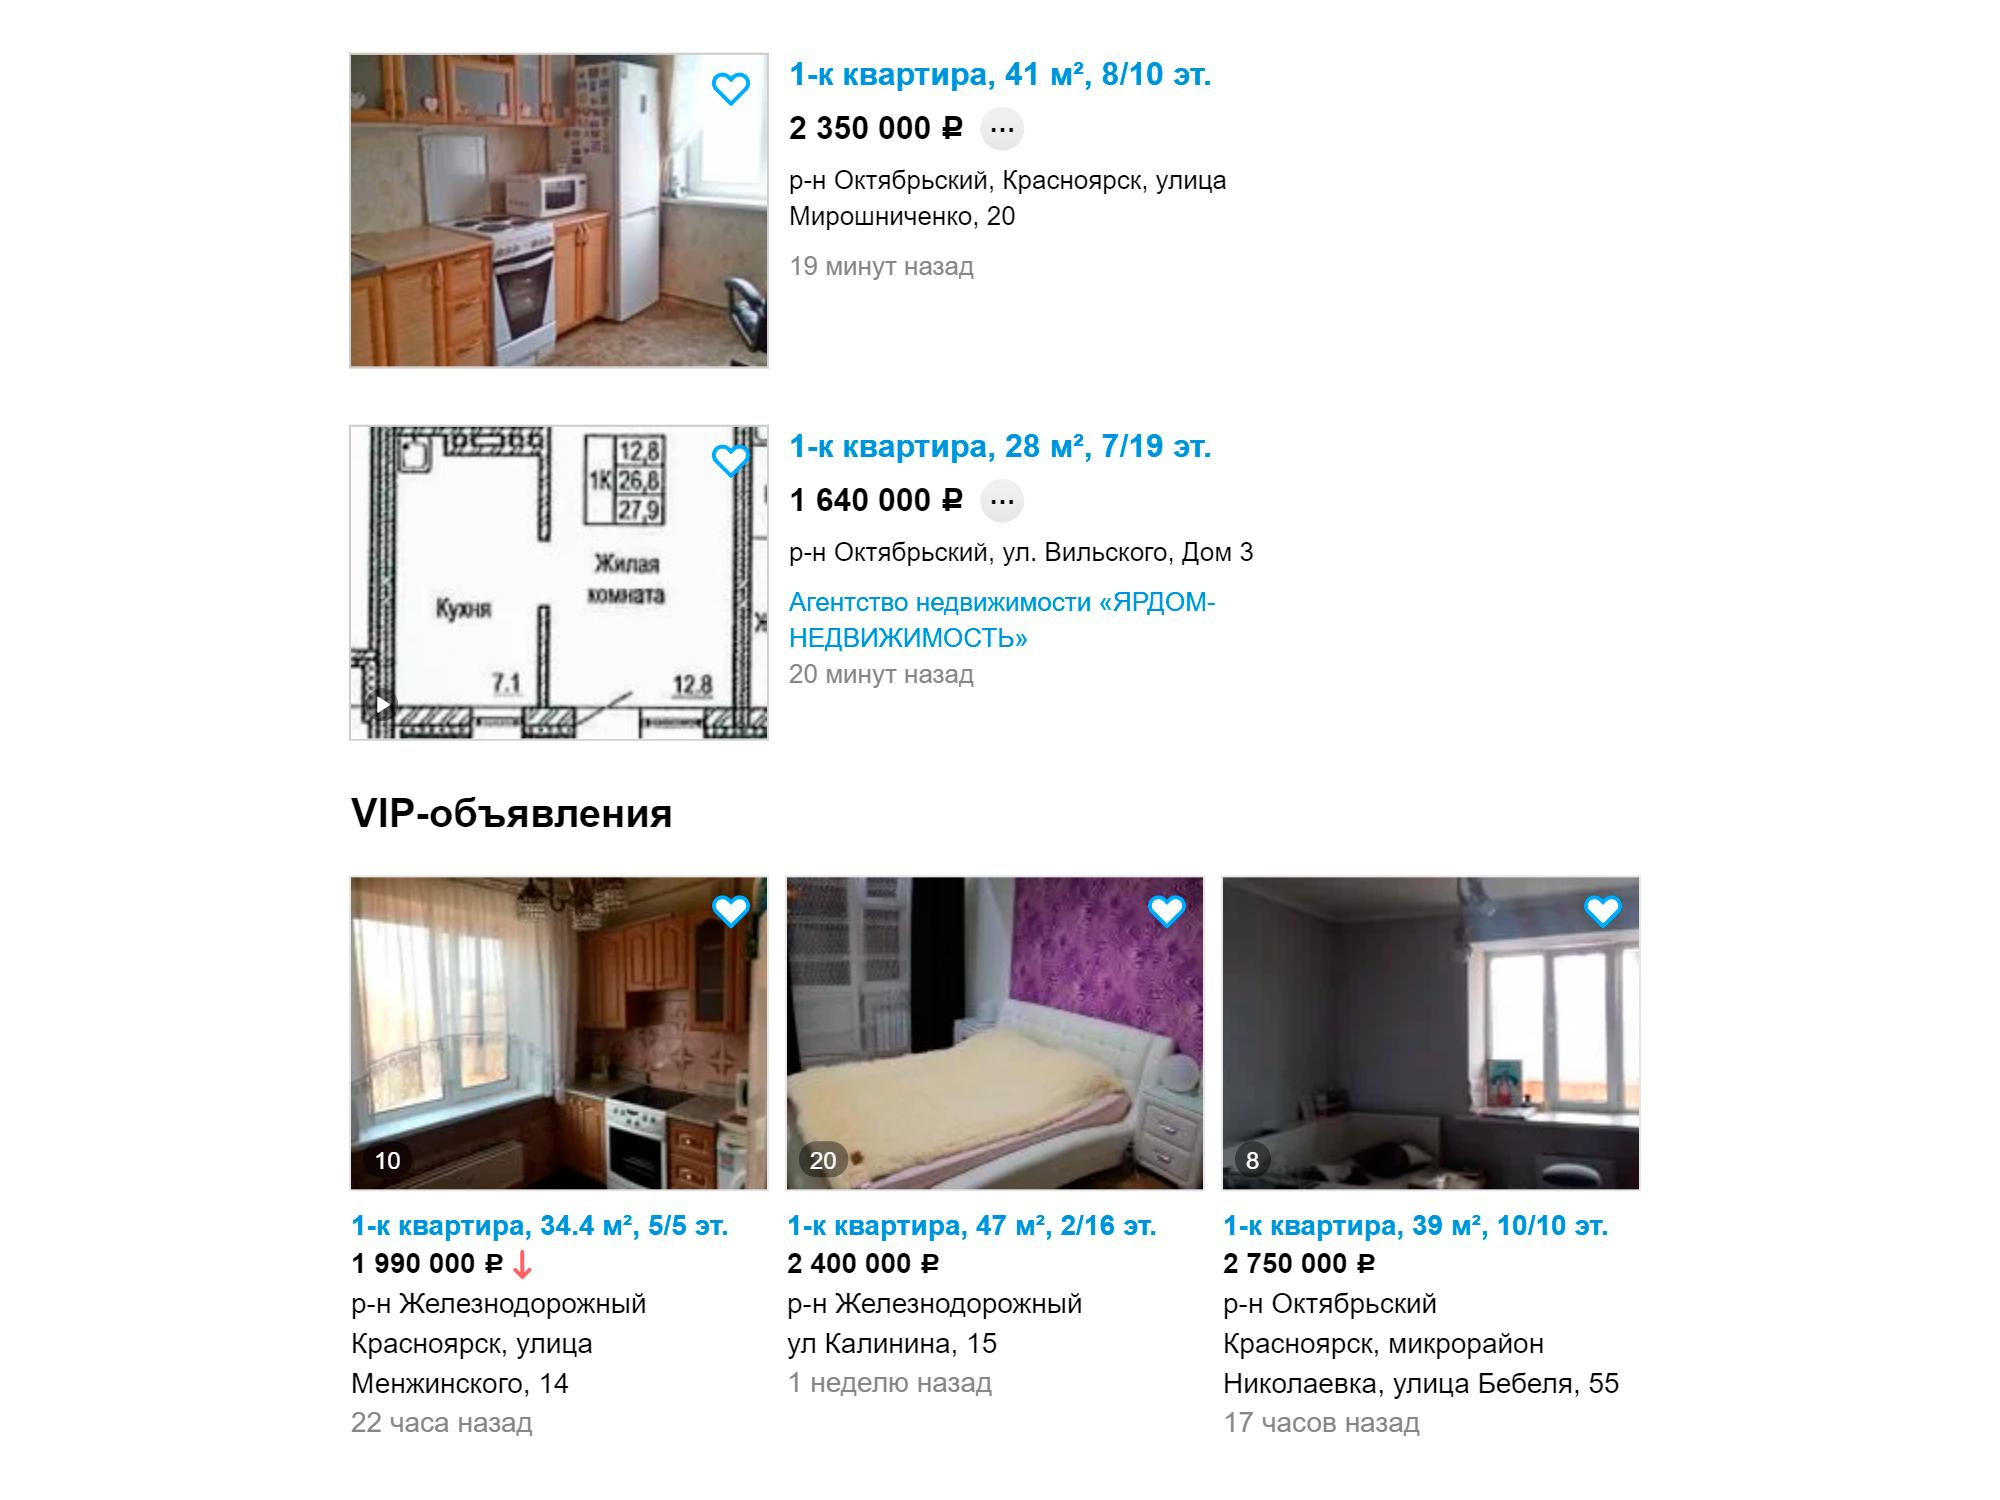 Цены на однокомнатные квартиры на «Авито»